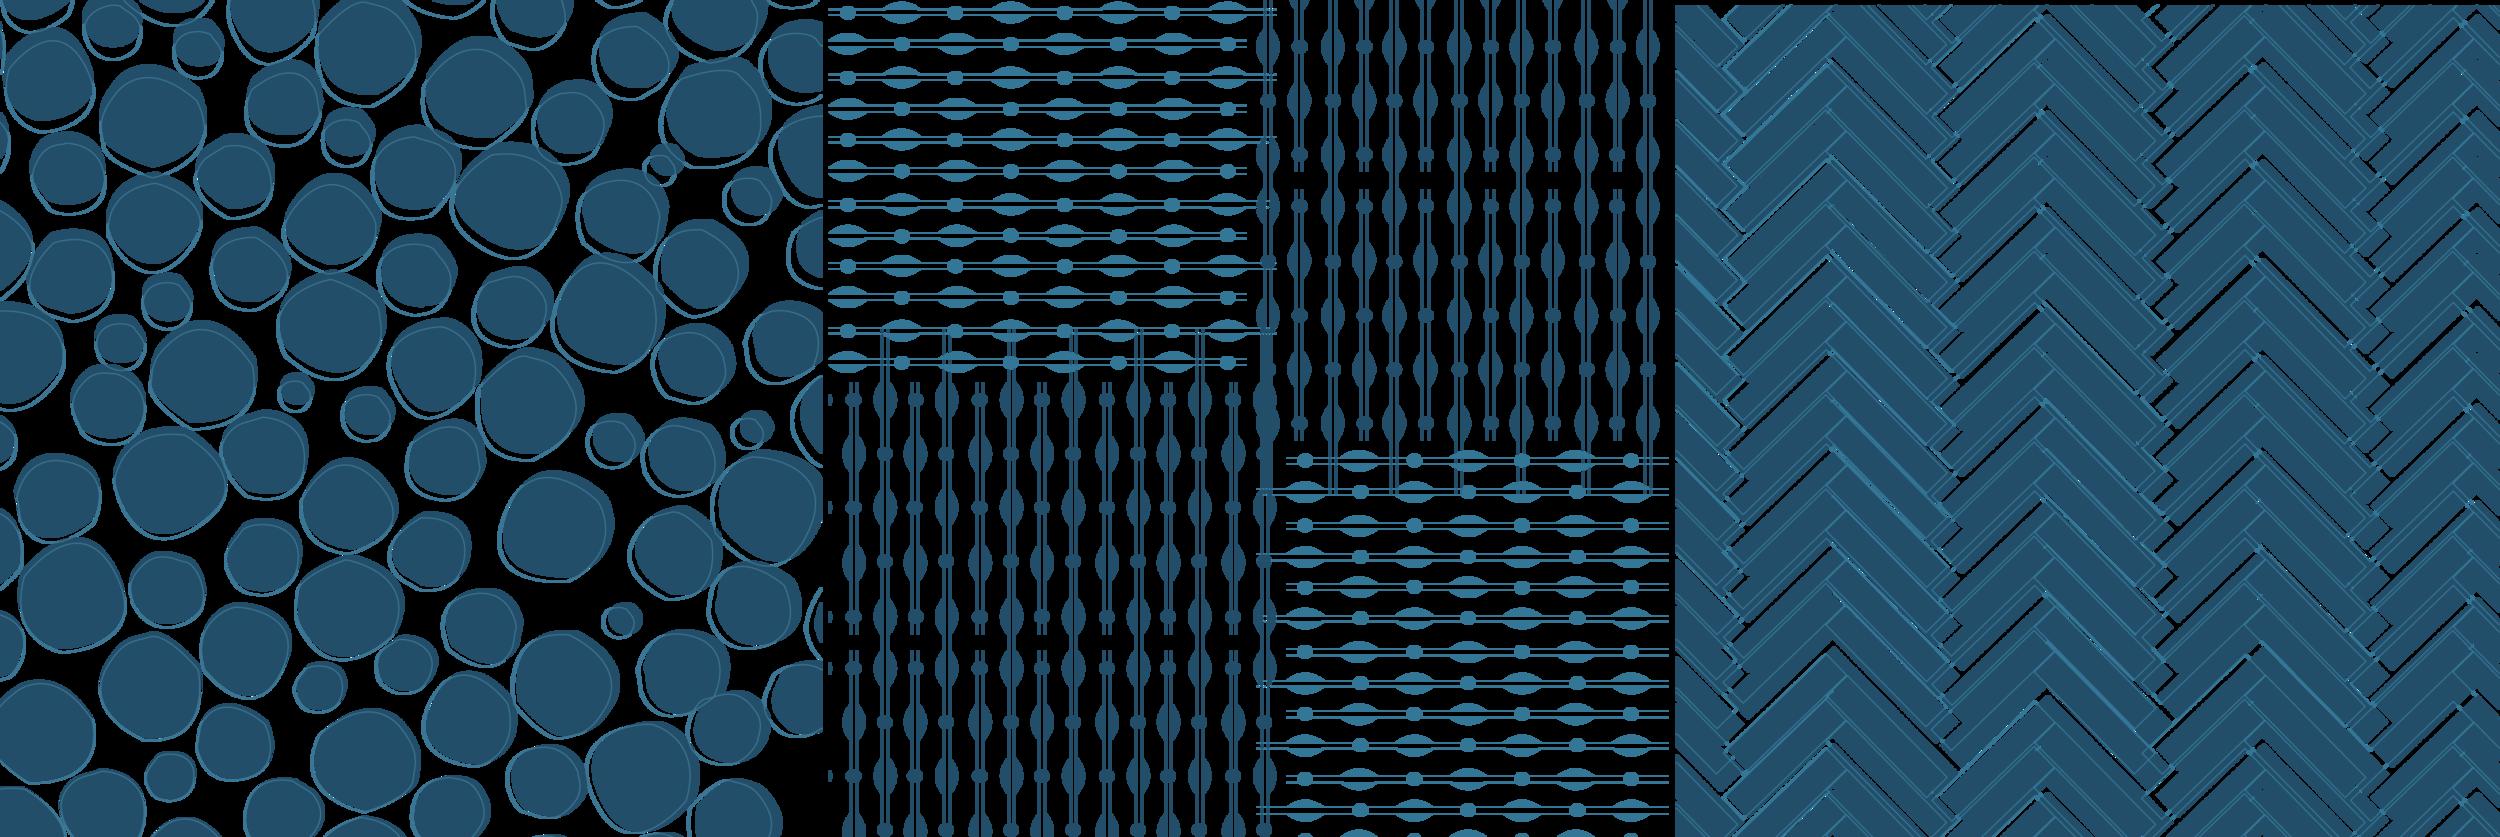 cypressedgeinn32-15.png